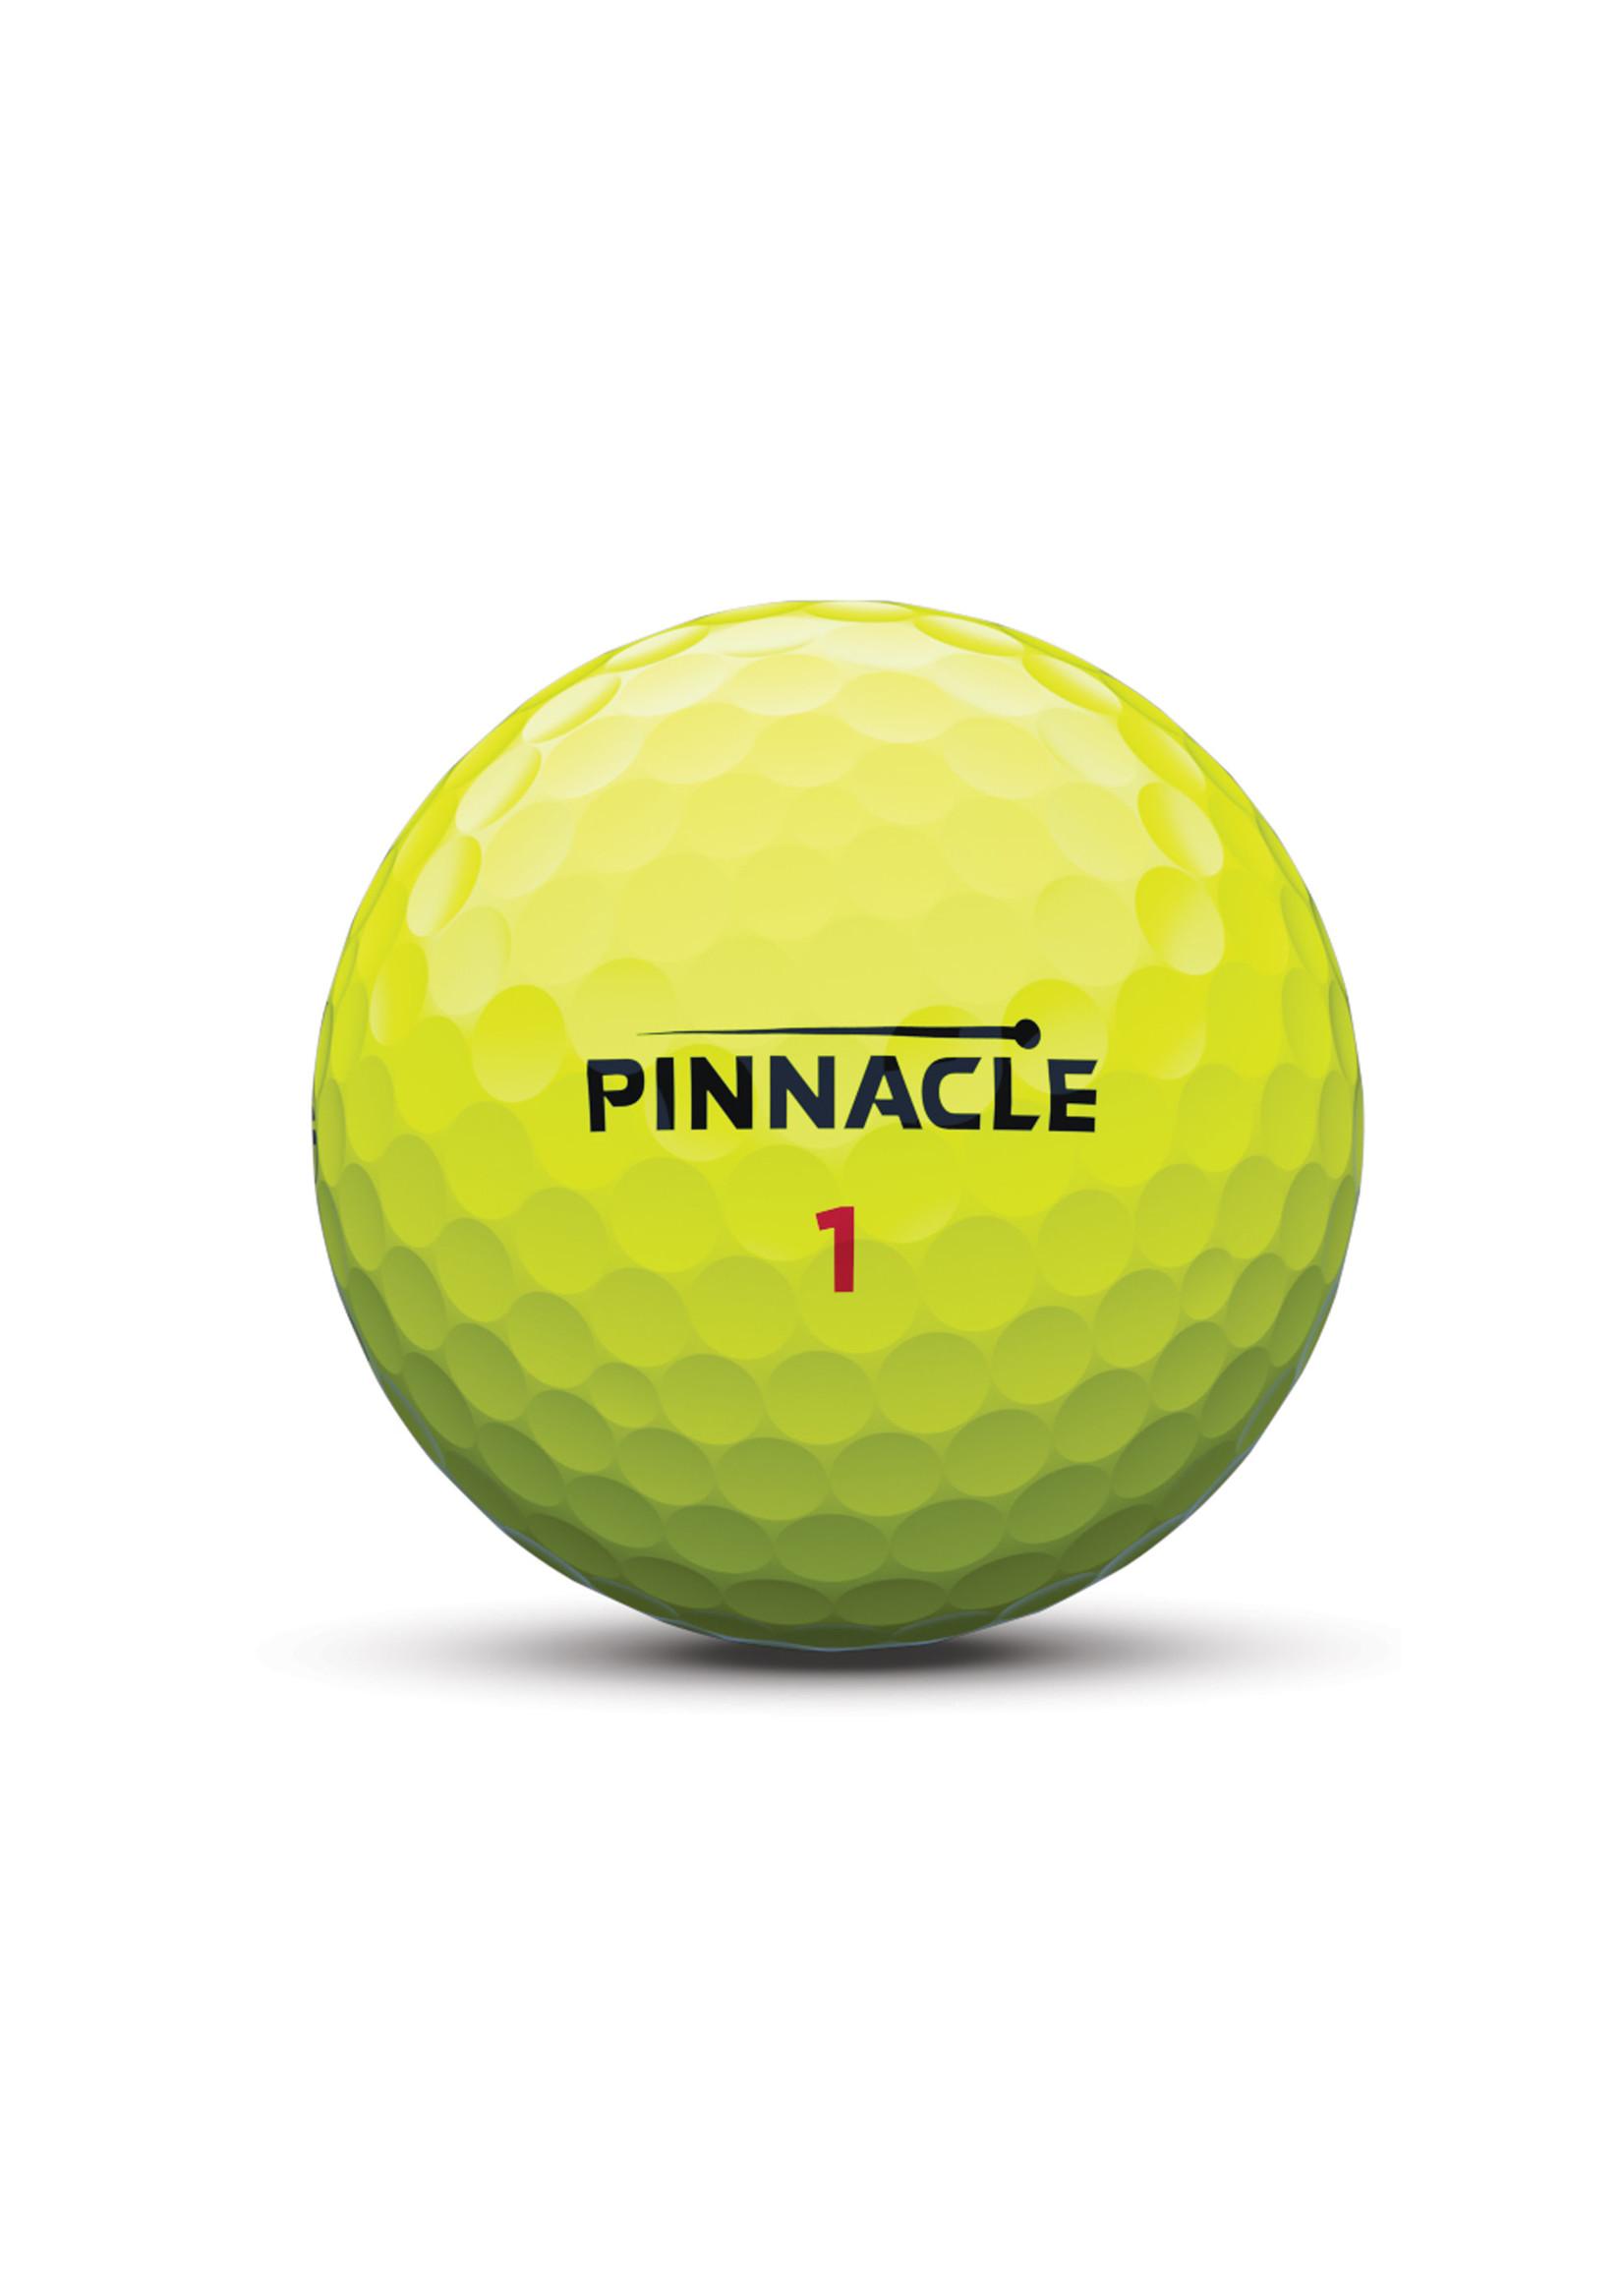 Pinnacle Pinnacle Rush Golf Balls, 15 Pack (2020) - Yellow